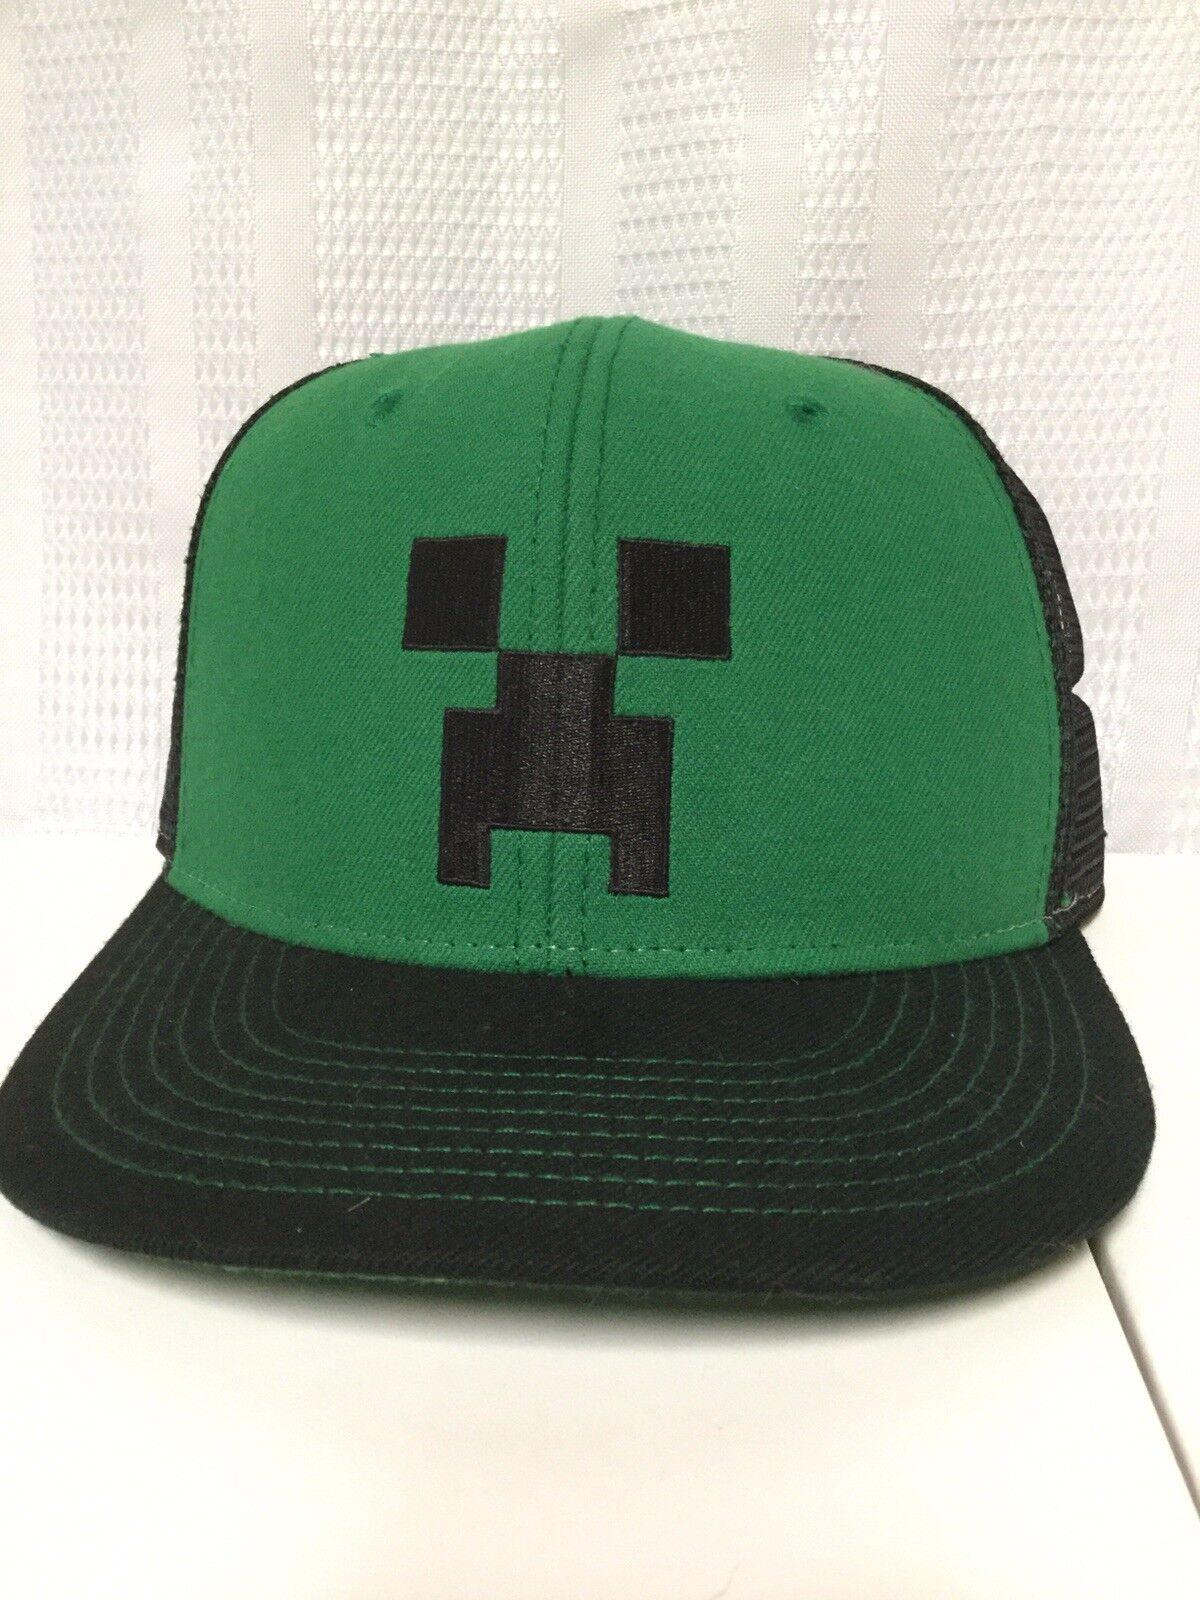 1b153e9eb43 Minecraft Creeper Green Black Adjustable Snapback Cap Hat